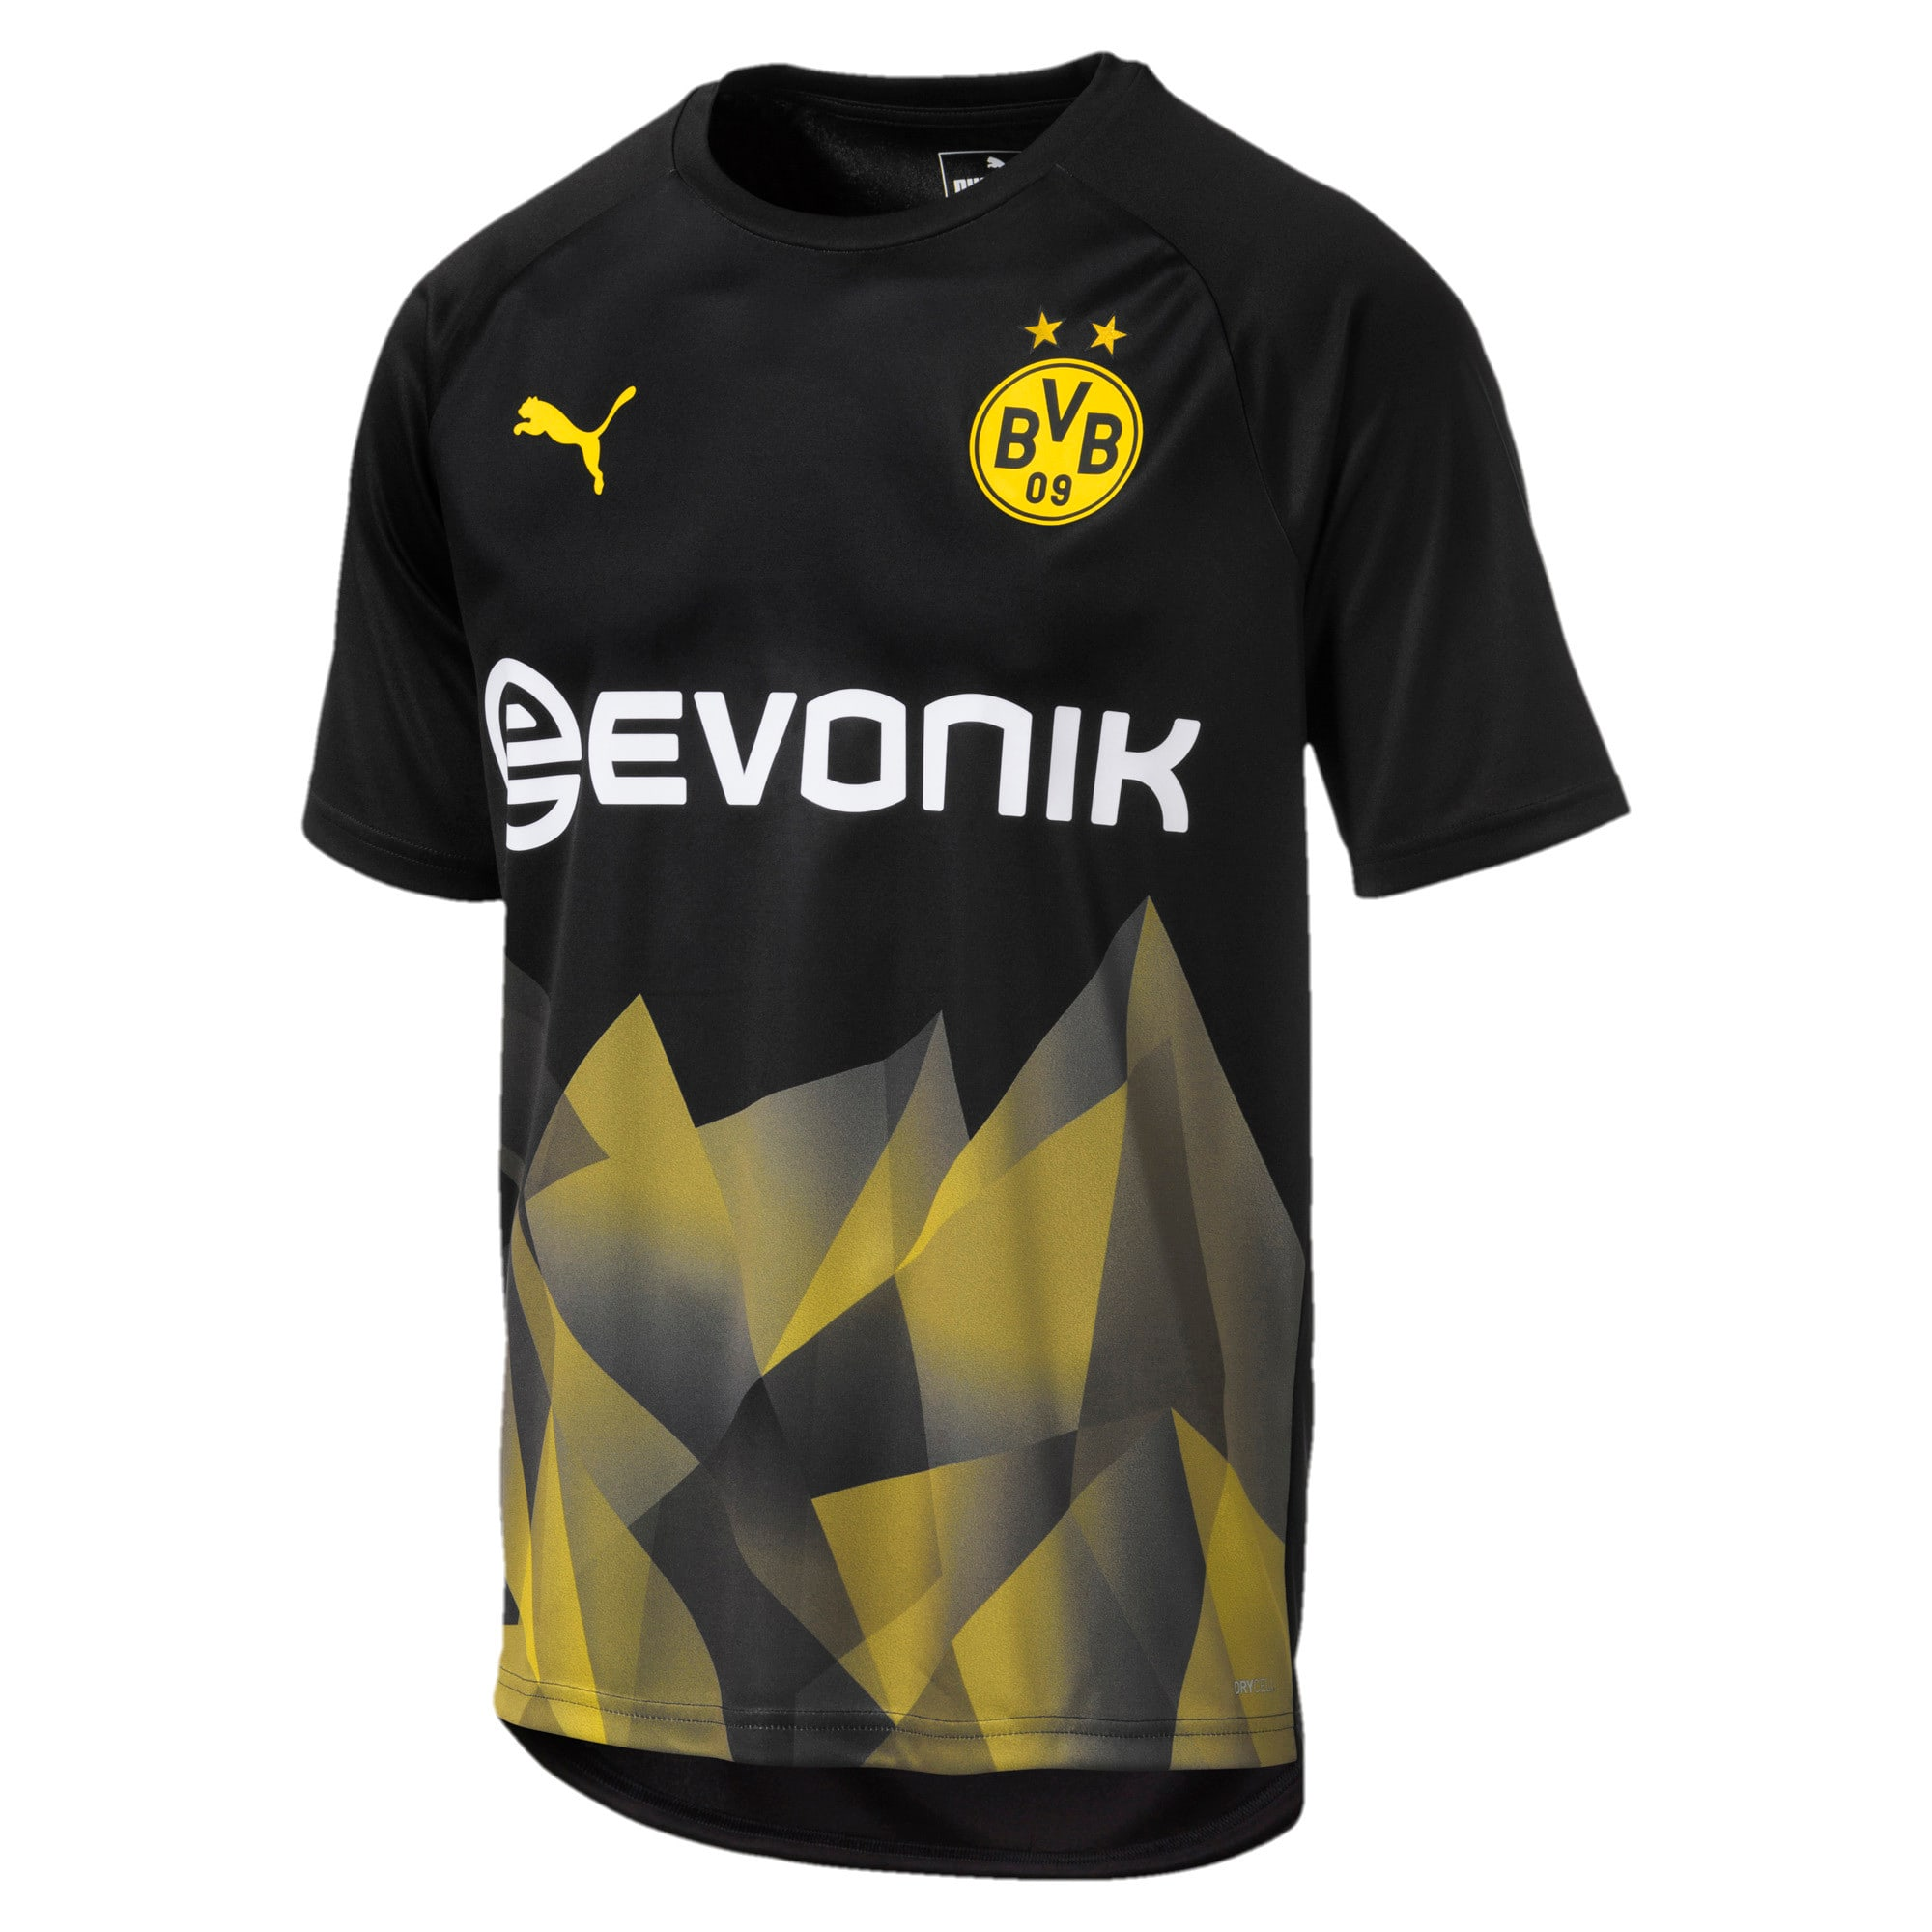 Thumbnail 1 of BVB Men's International Stadium Jersey, Puma Black-Cyber Yellow, medium